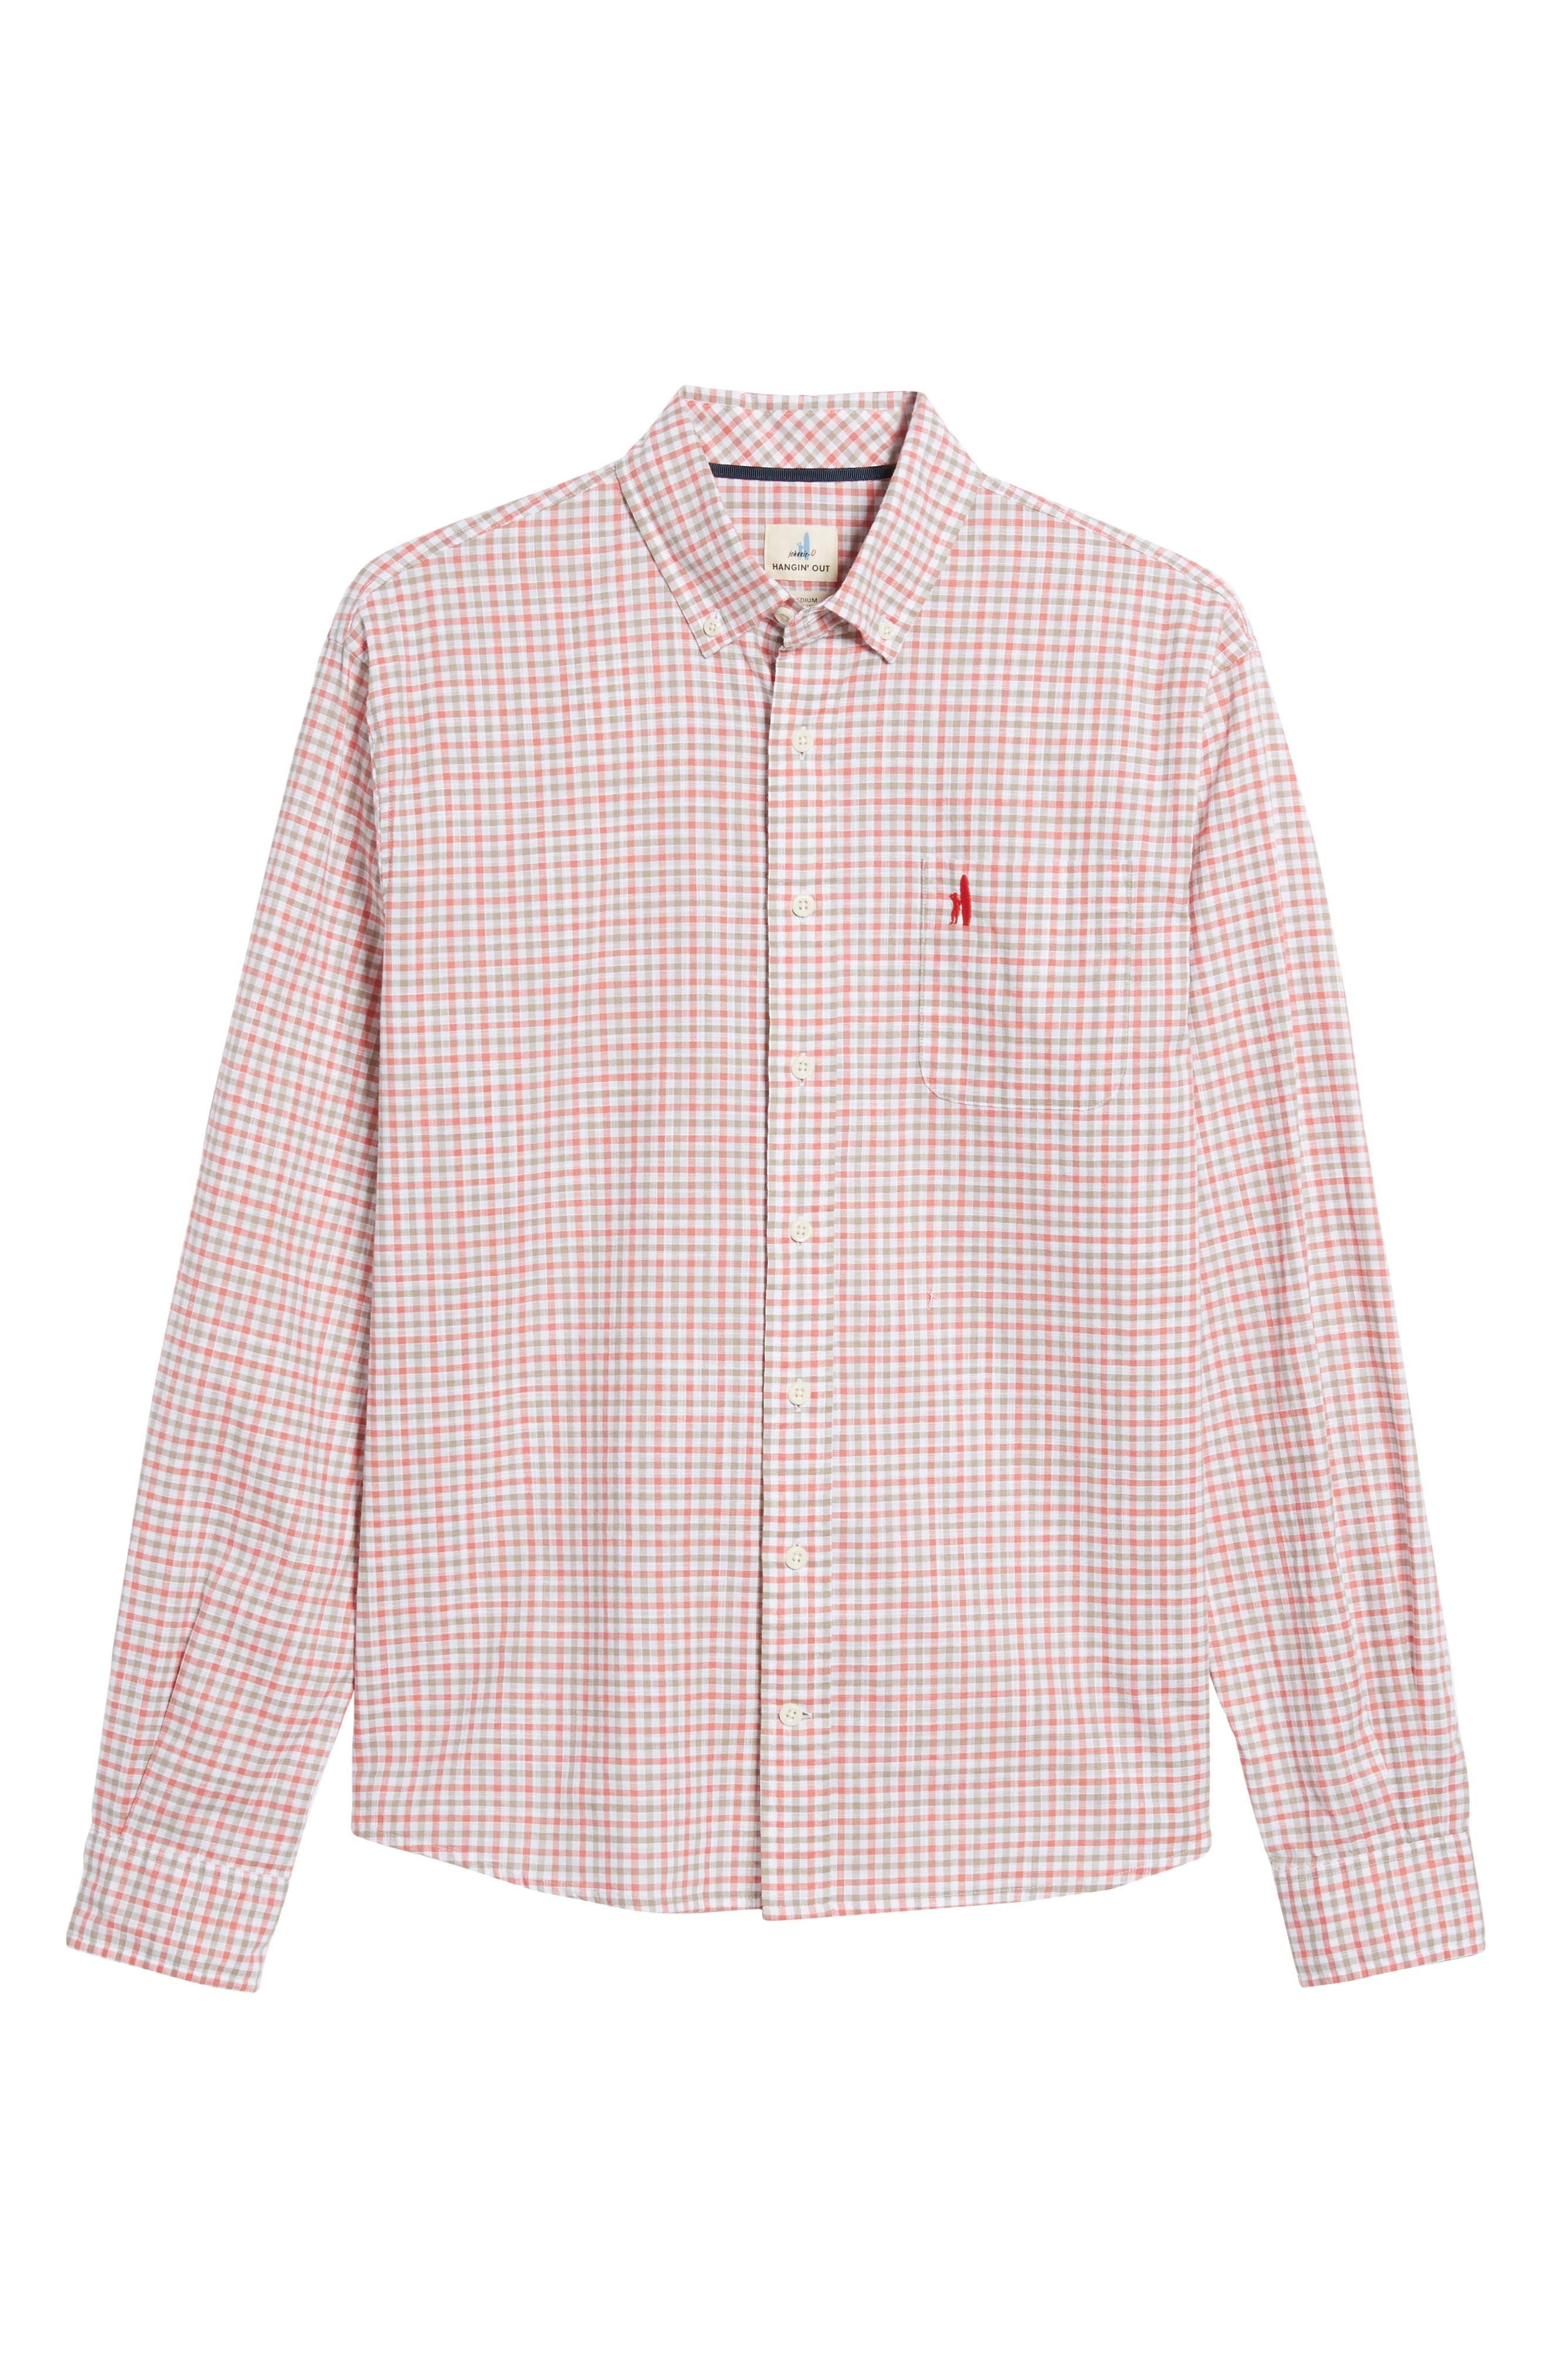 JOHNNIE-O,                             Driscoll Regular Fit Sport Shirt,                             Alternate thumbnail 6, color,                             630